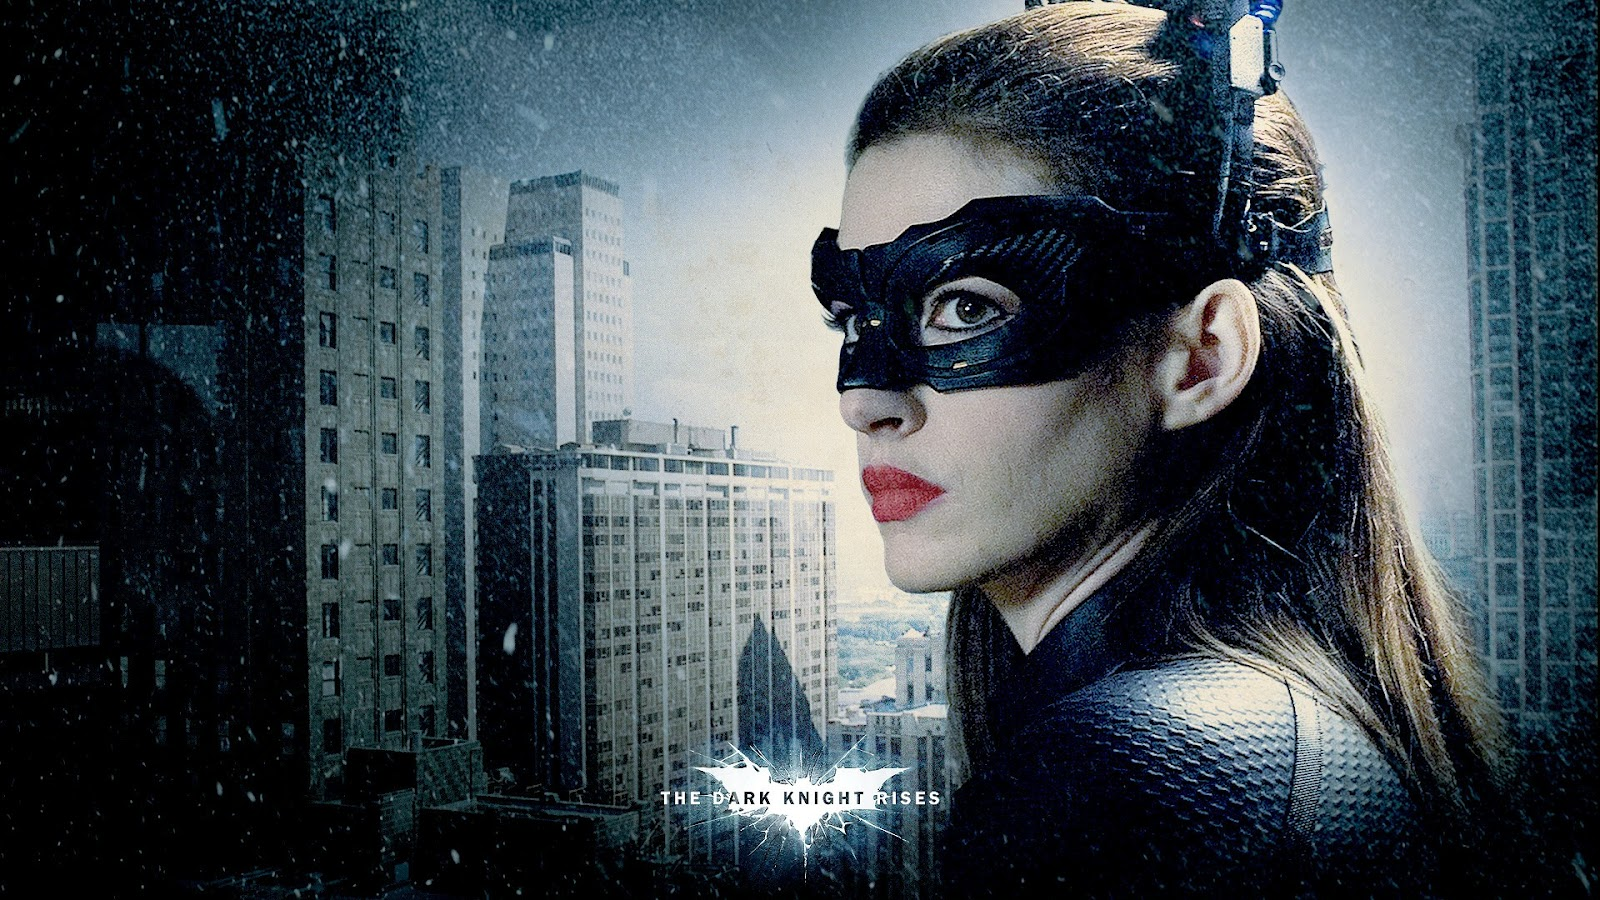 http://1.bp.blogspot.com/-NG7mYWKEkus/UArRieBnQqI/AAAAAAAAC94/n2CzdmufZKQ/s1600/Anne_Hathaway_Catwoman_The_Dark_Knight_Rises_HD_Wallpaper-Vvallpaper.Net.jpg